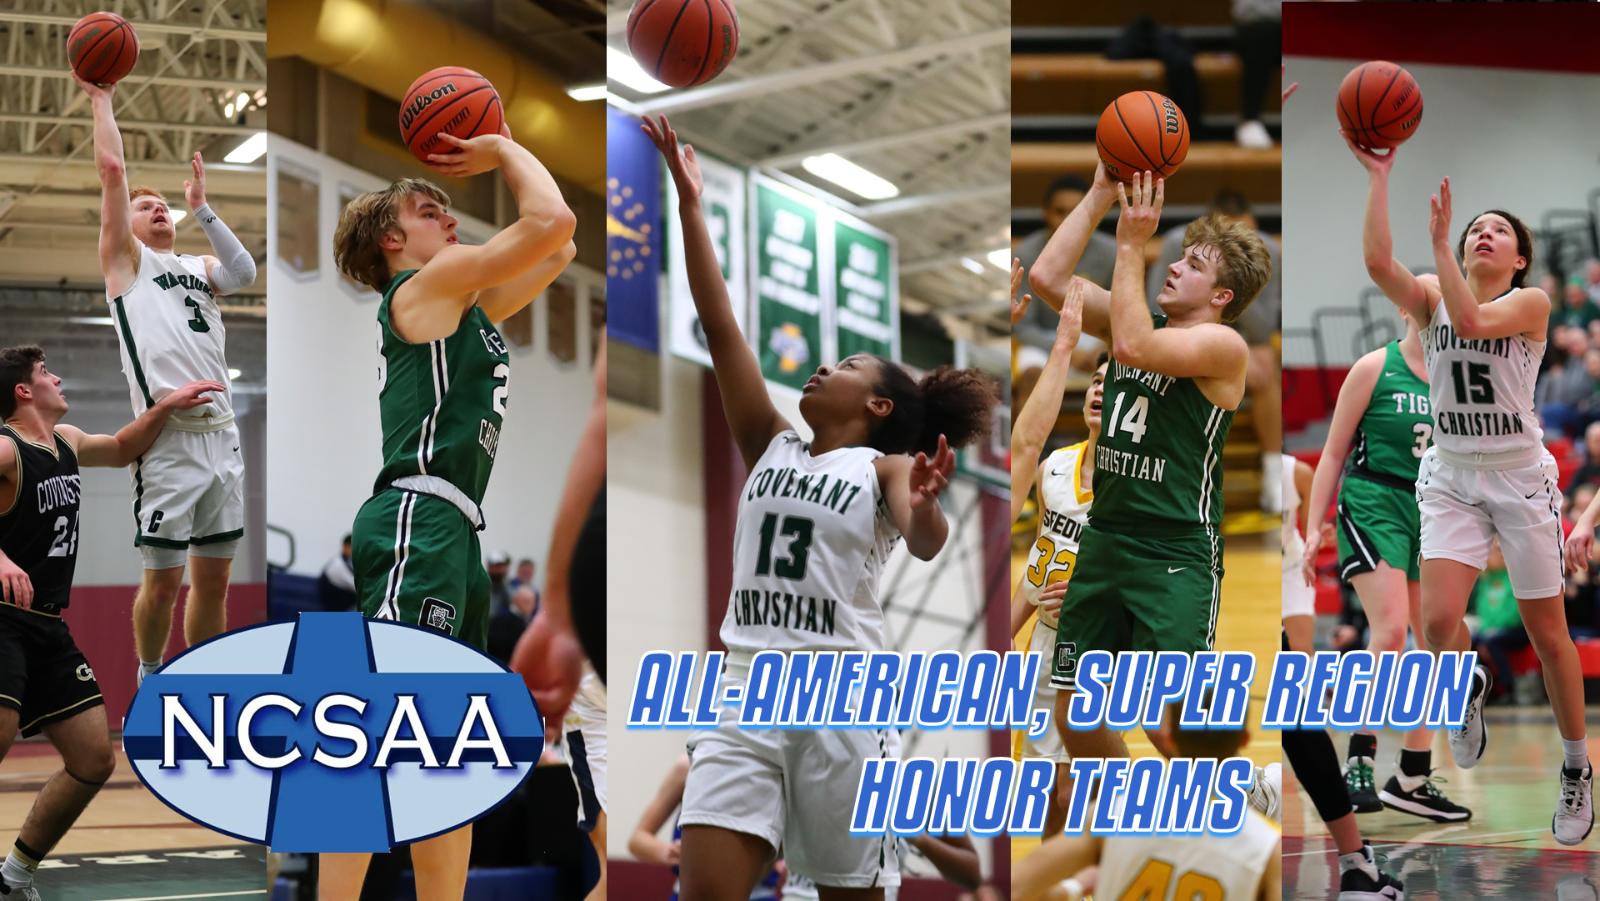 NCSAA Releases Basketball All-American, Super Region Teams